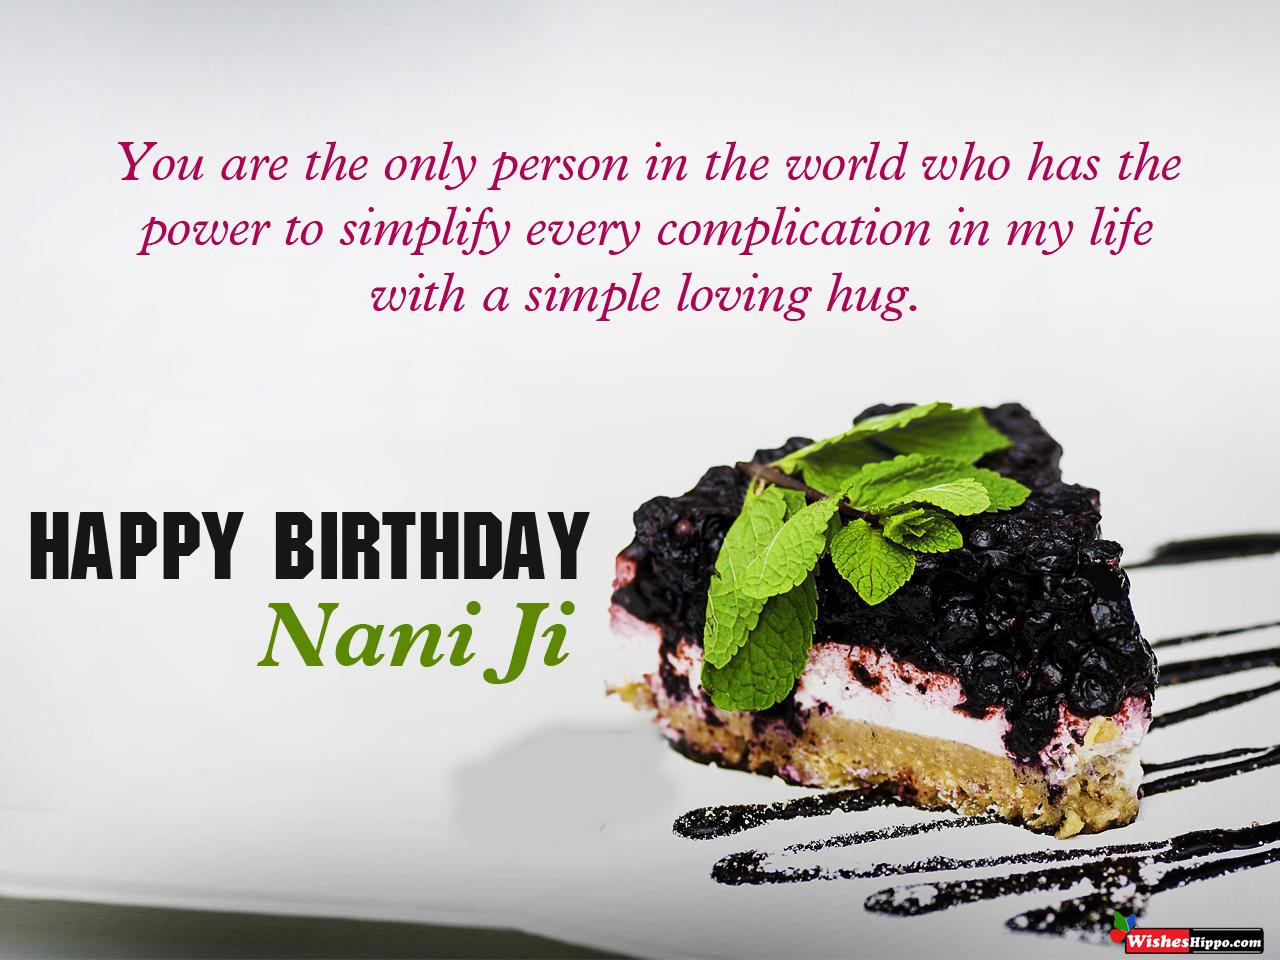 149 Birthday Wishes For Nani In Hindi And English Images 2021 Wisheshippo